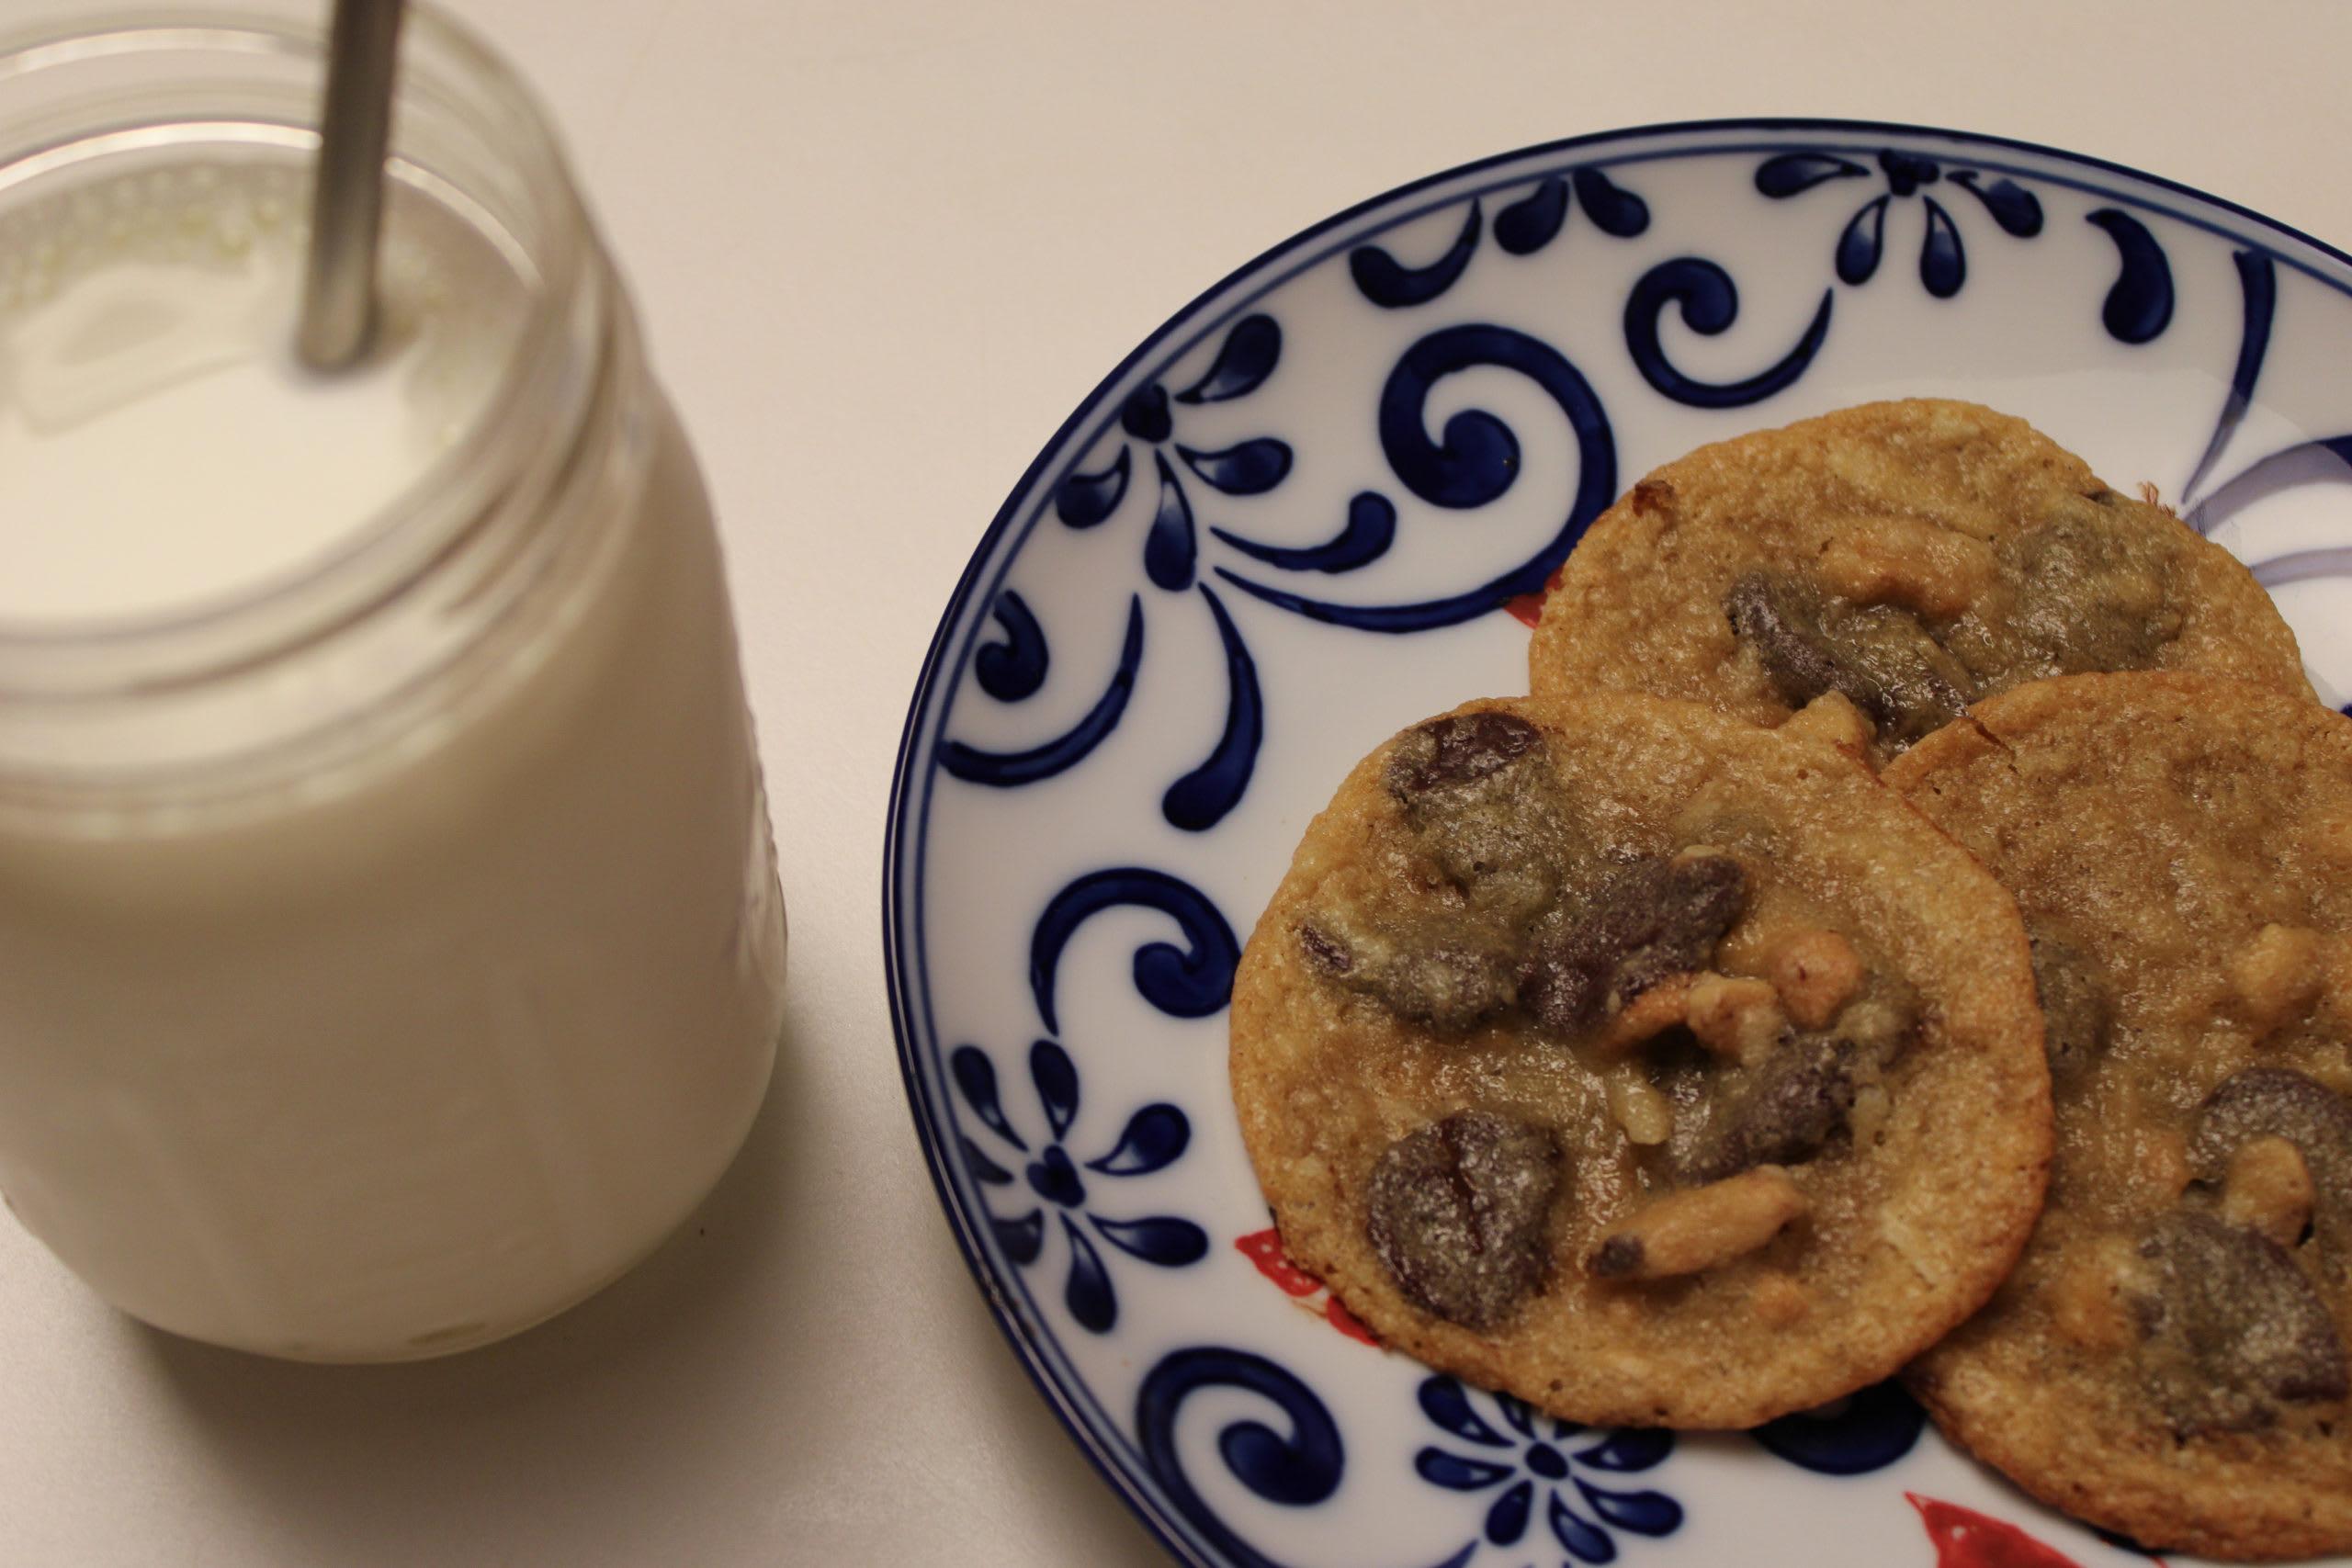 Chef Lotti's Gluten-Free Chocolate Chip Cookies